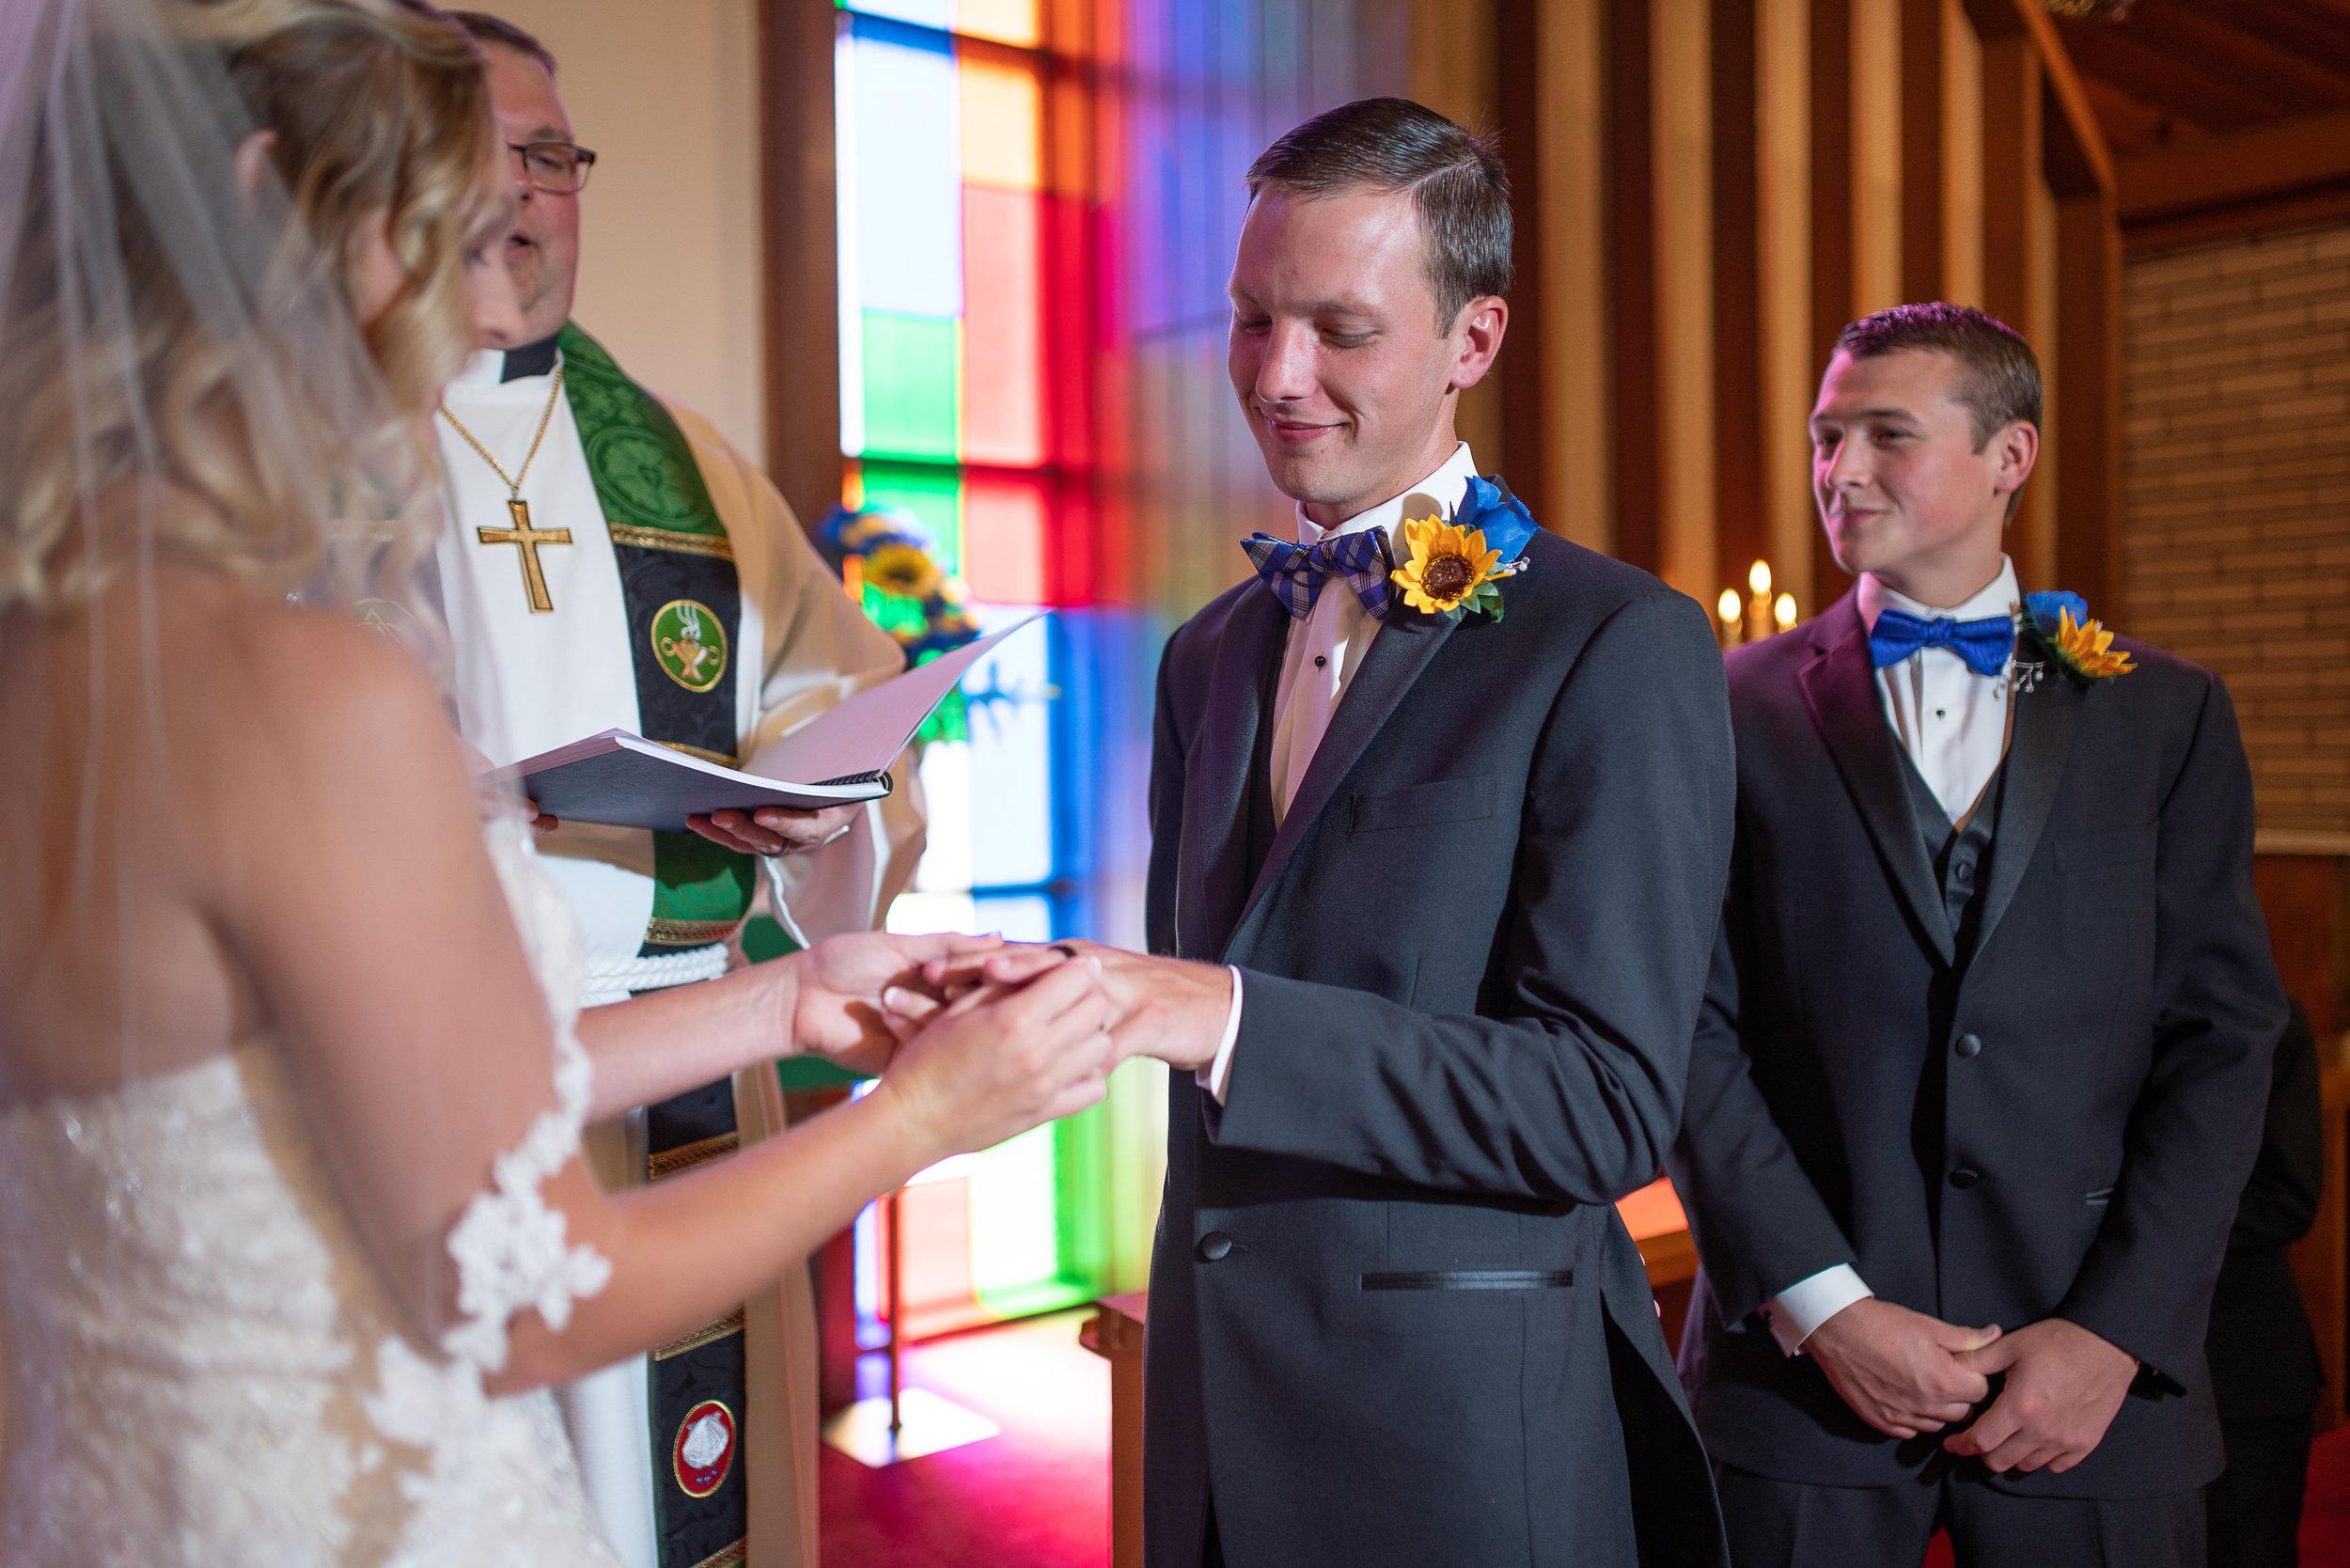 Ceremony-36.jpg